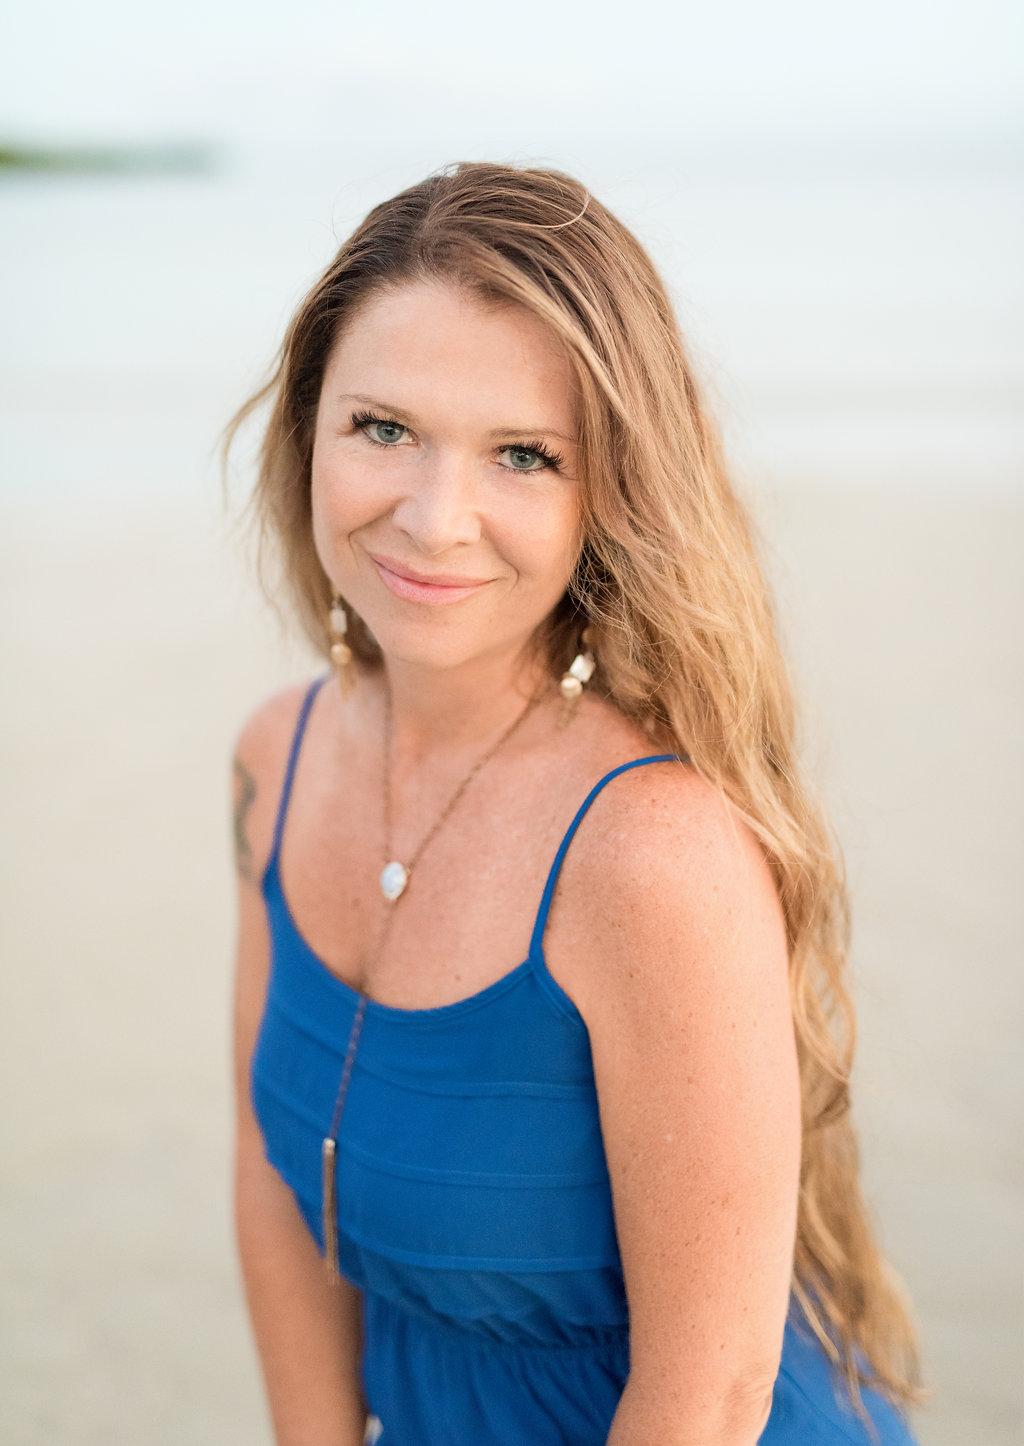 Honolulu Portrait Photographer | Oahu Branding Portraits | beach woman